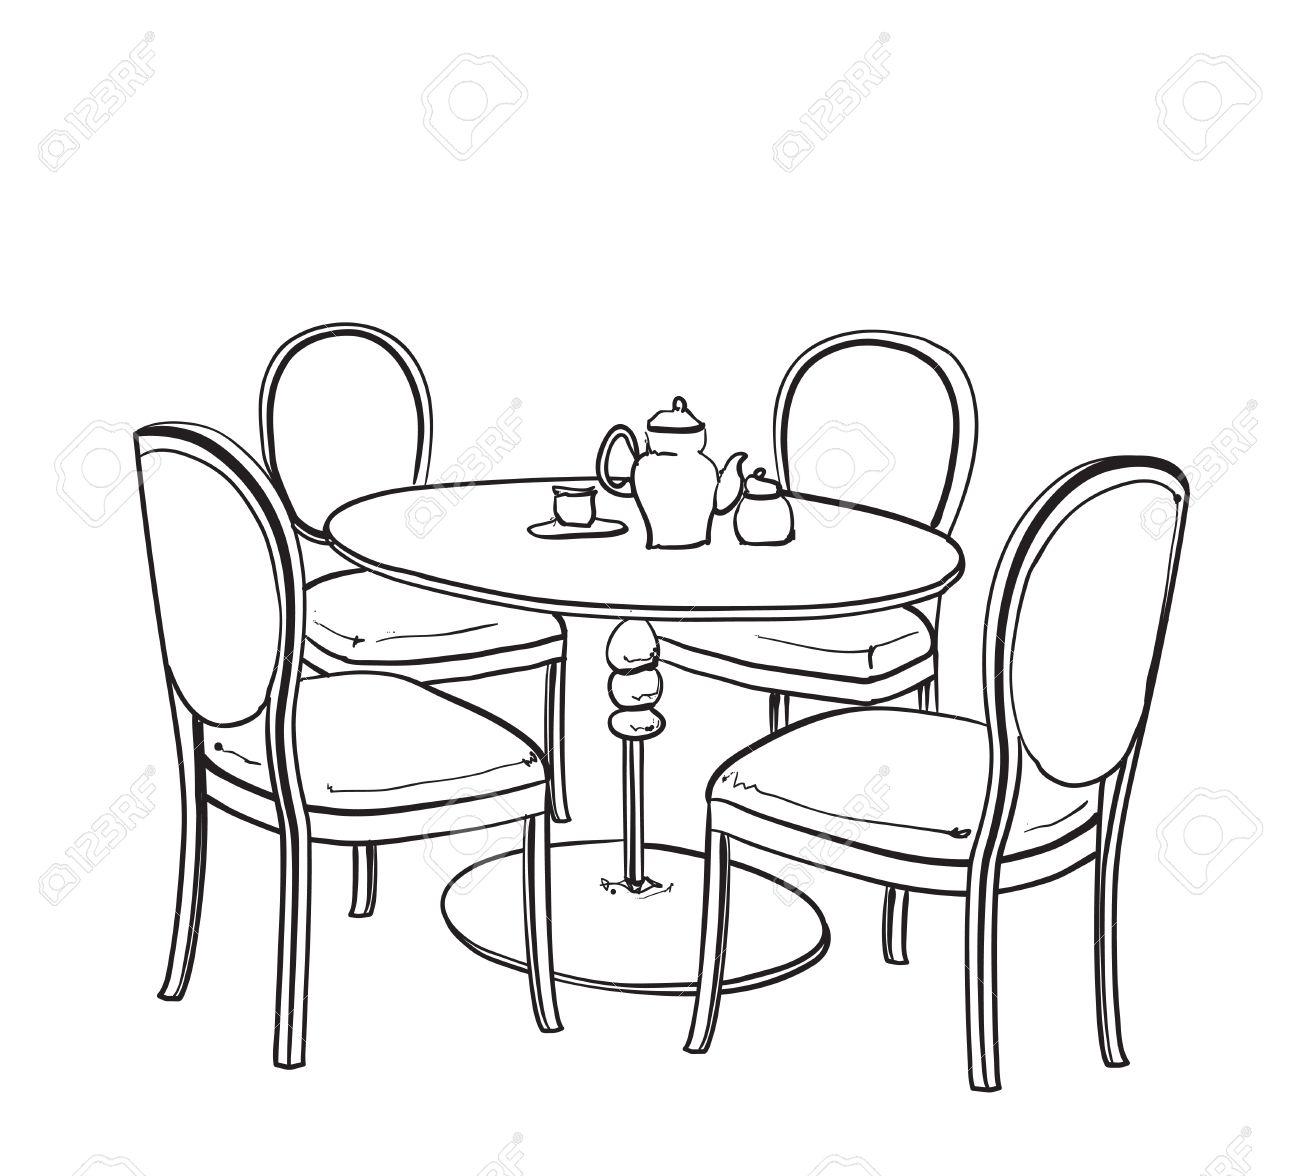 mesa y silla infantil para dibujar